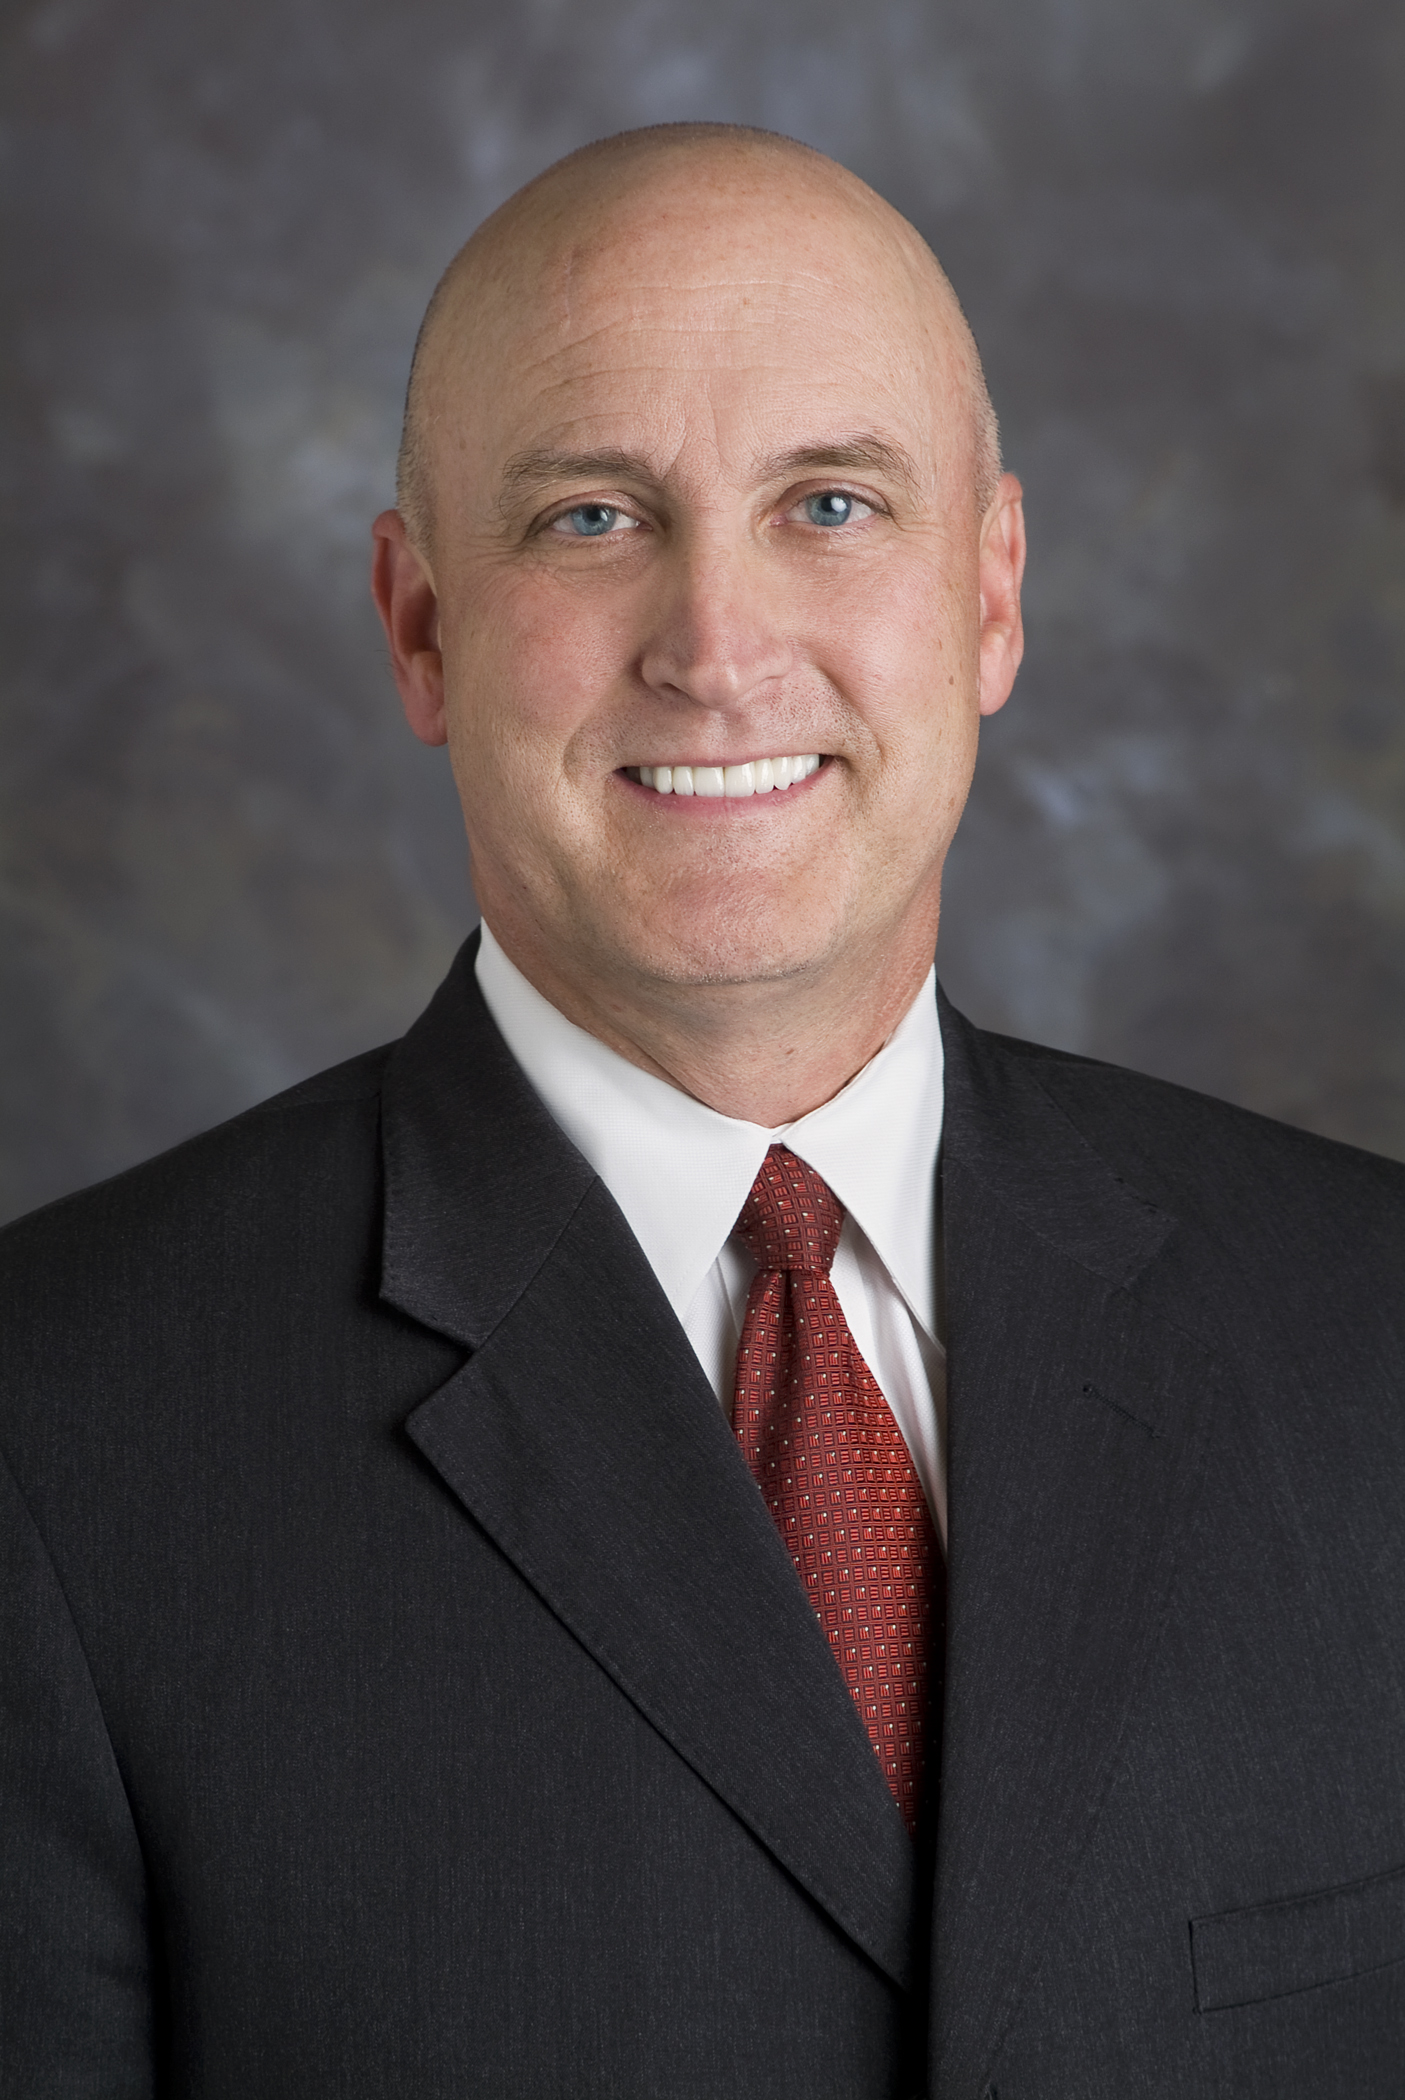 Ben R By Darren Black: CHE Trinity Health Names Benjamin R. Carter Chief